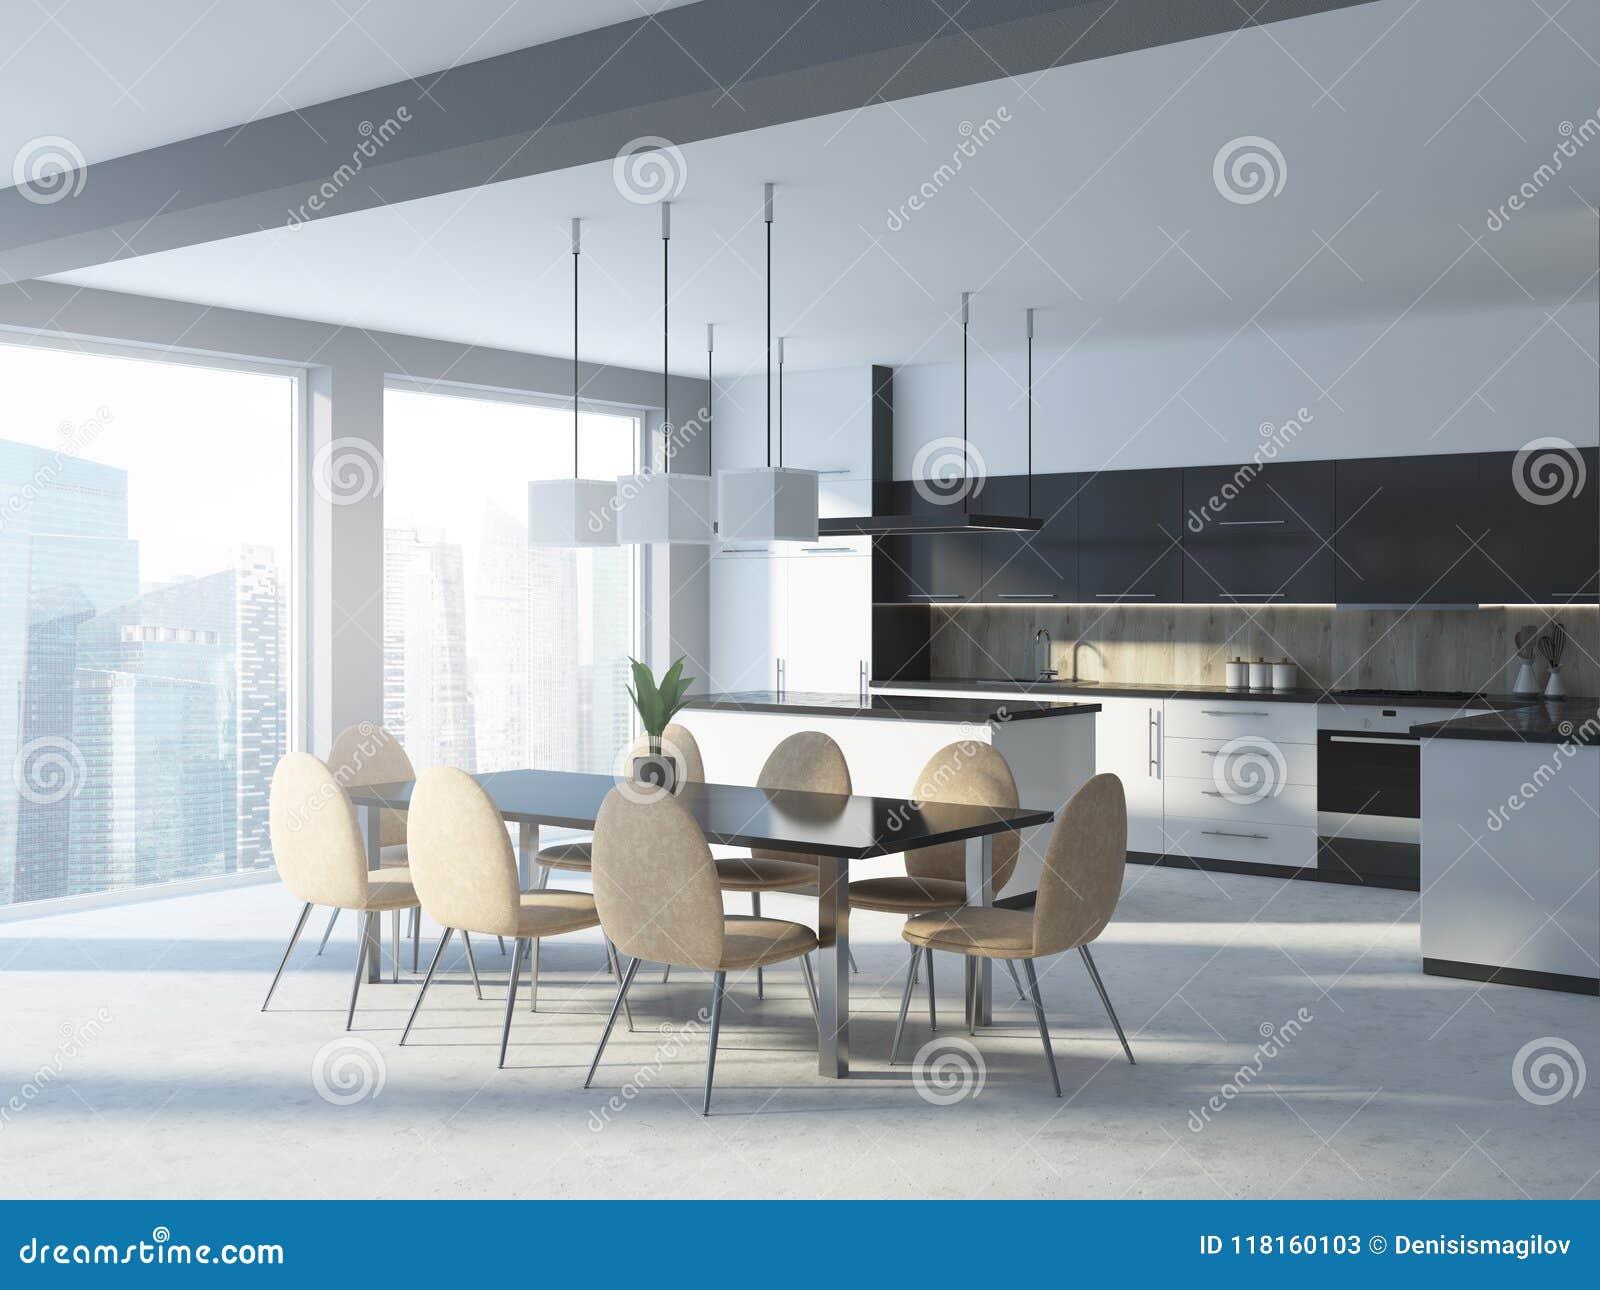 White And Wooden Kitchen Corner, Table Stock Illustration ...